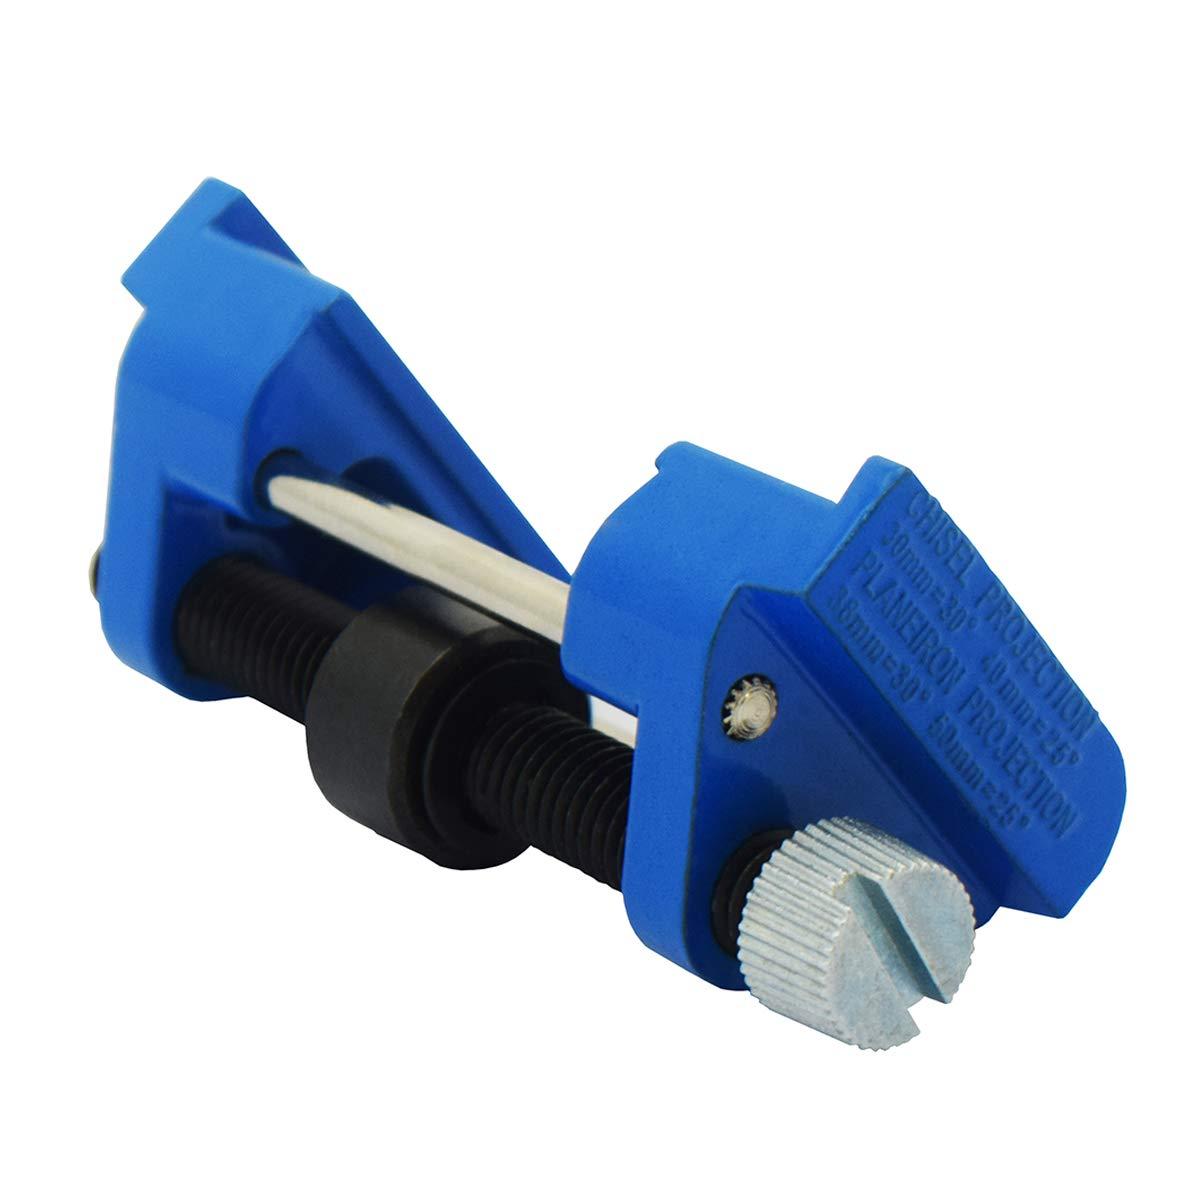 CartLife Sharpening Sharpener Clamping Chisels